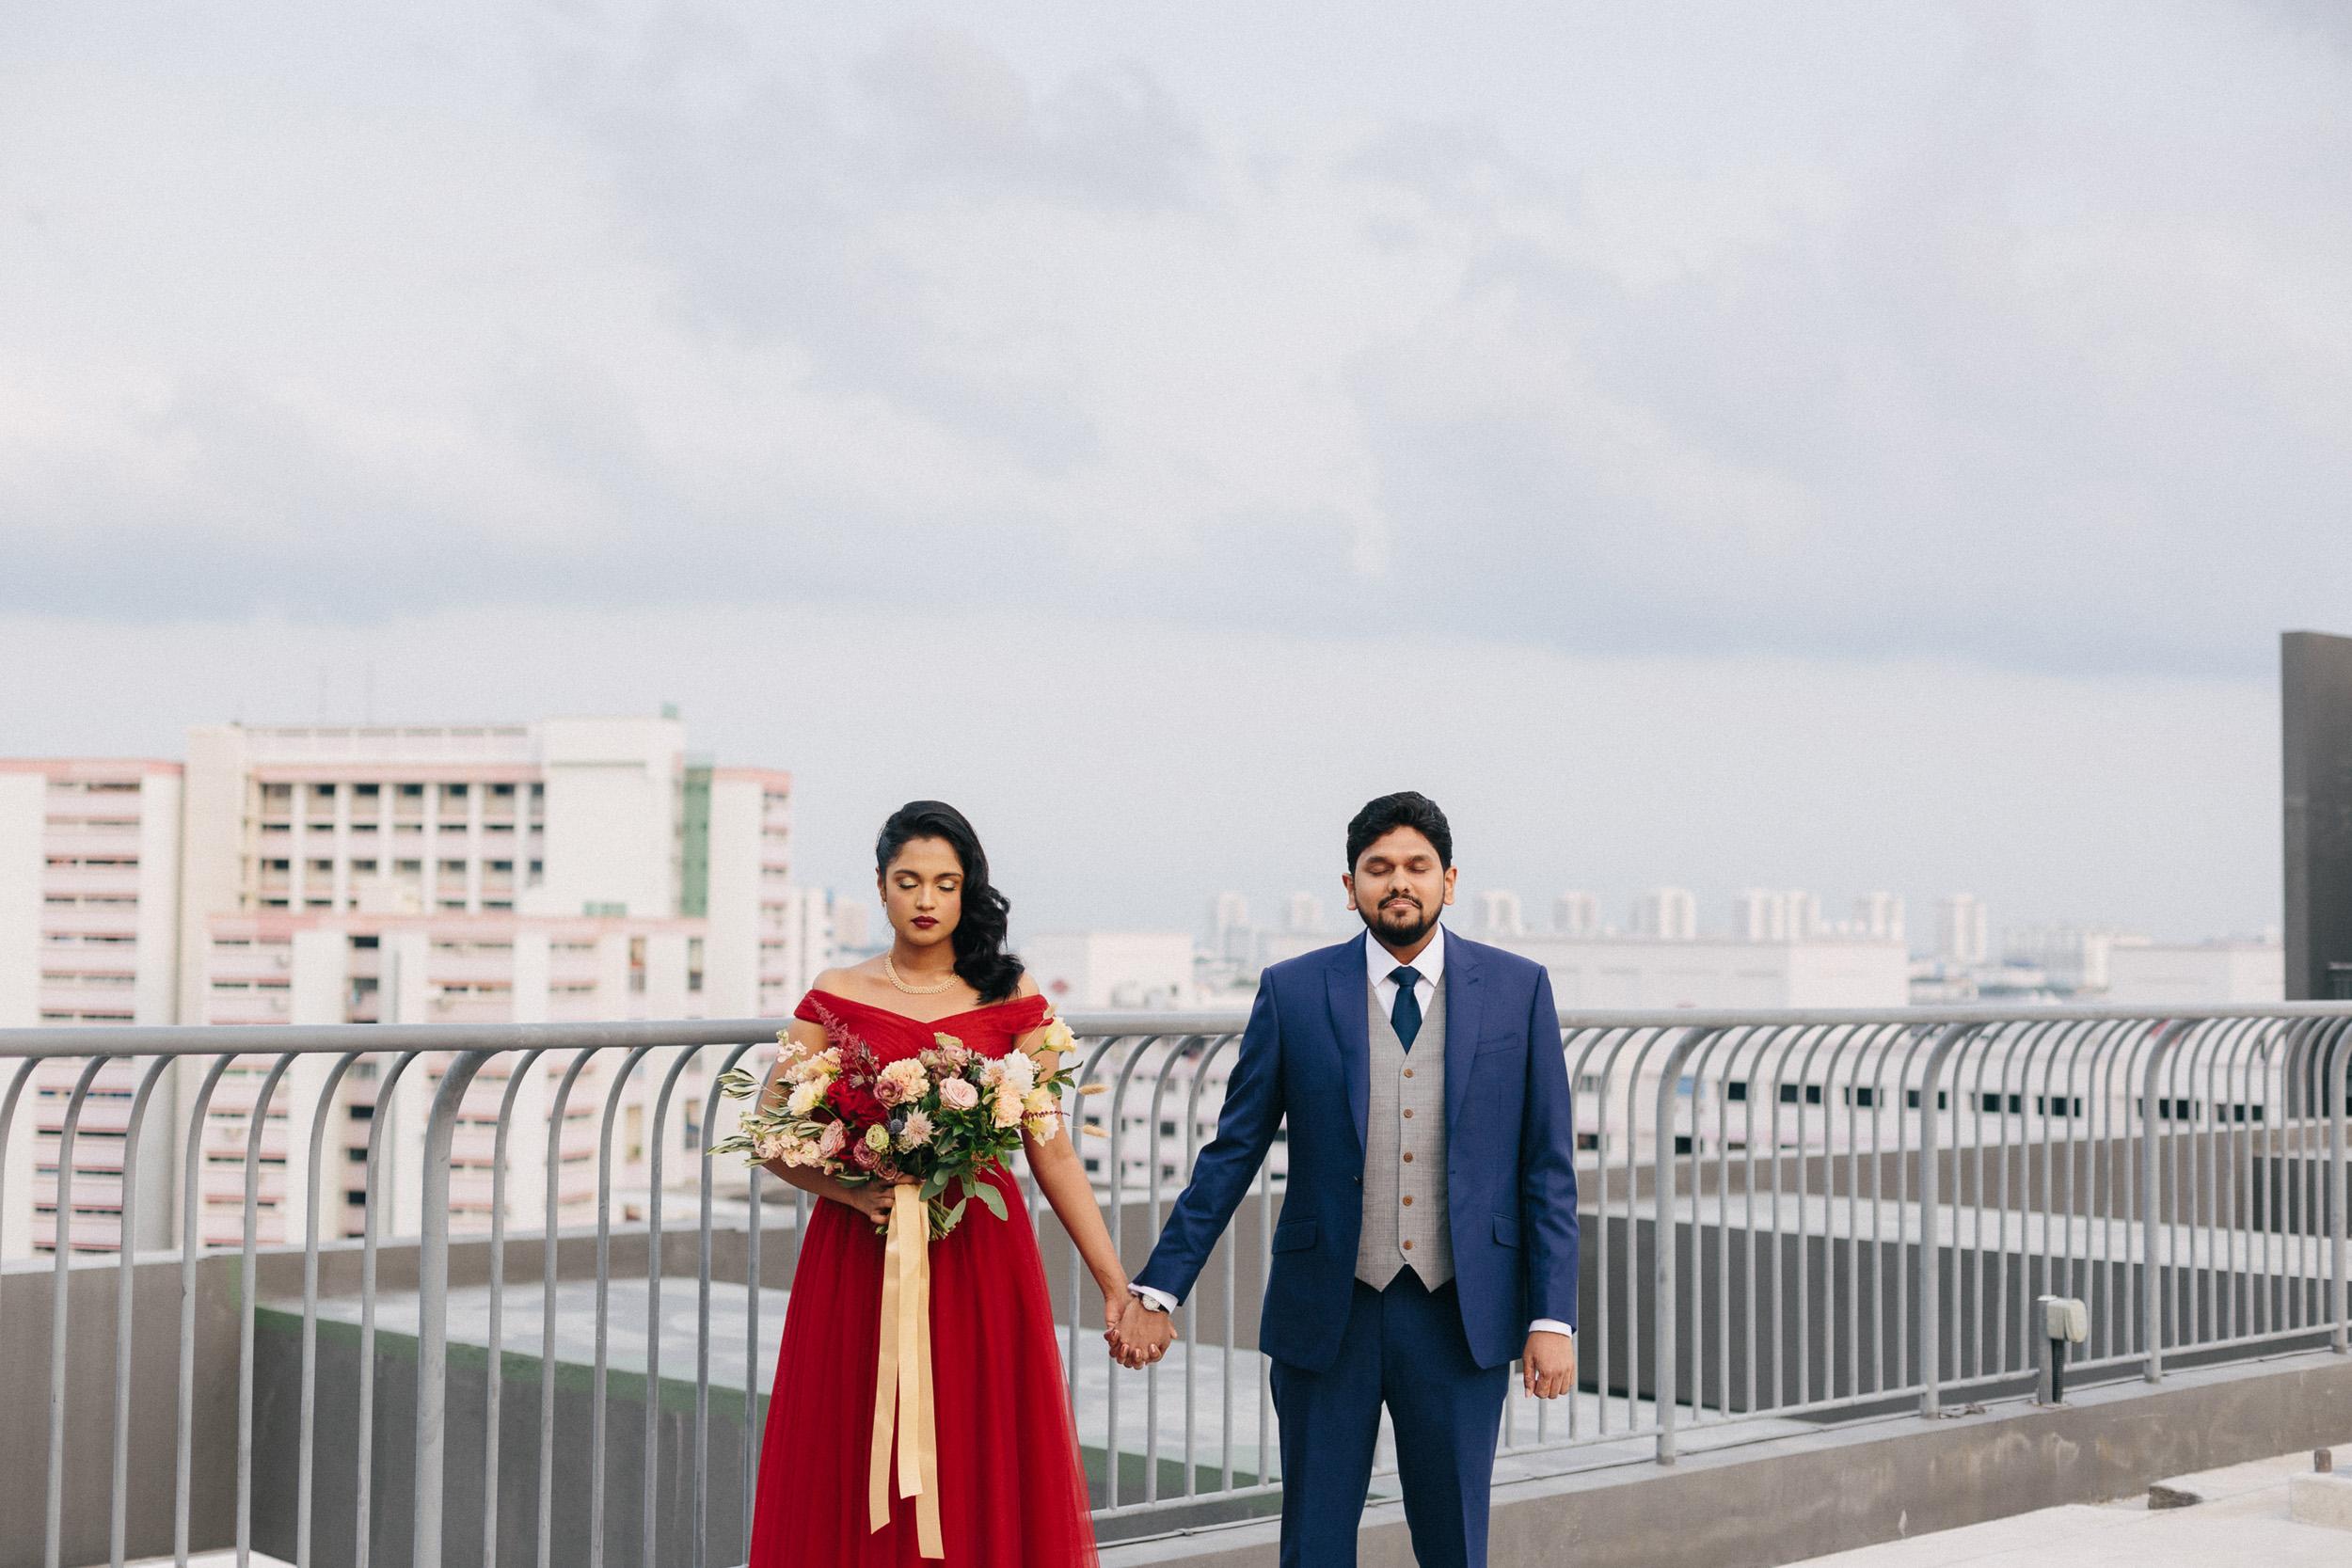 singapore-wedding-photographer-photography-wmt2017-093.jpg